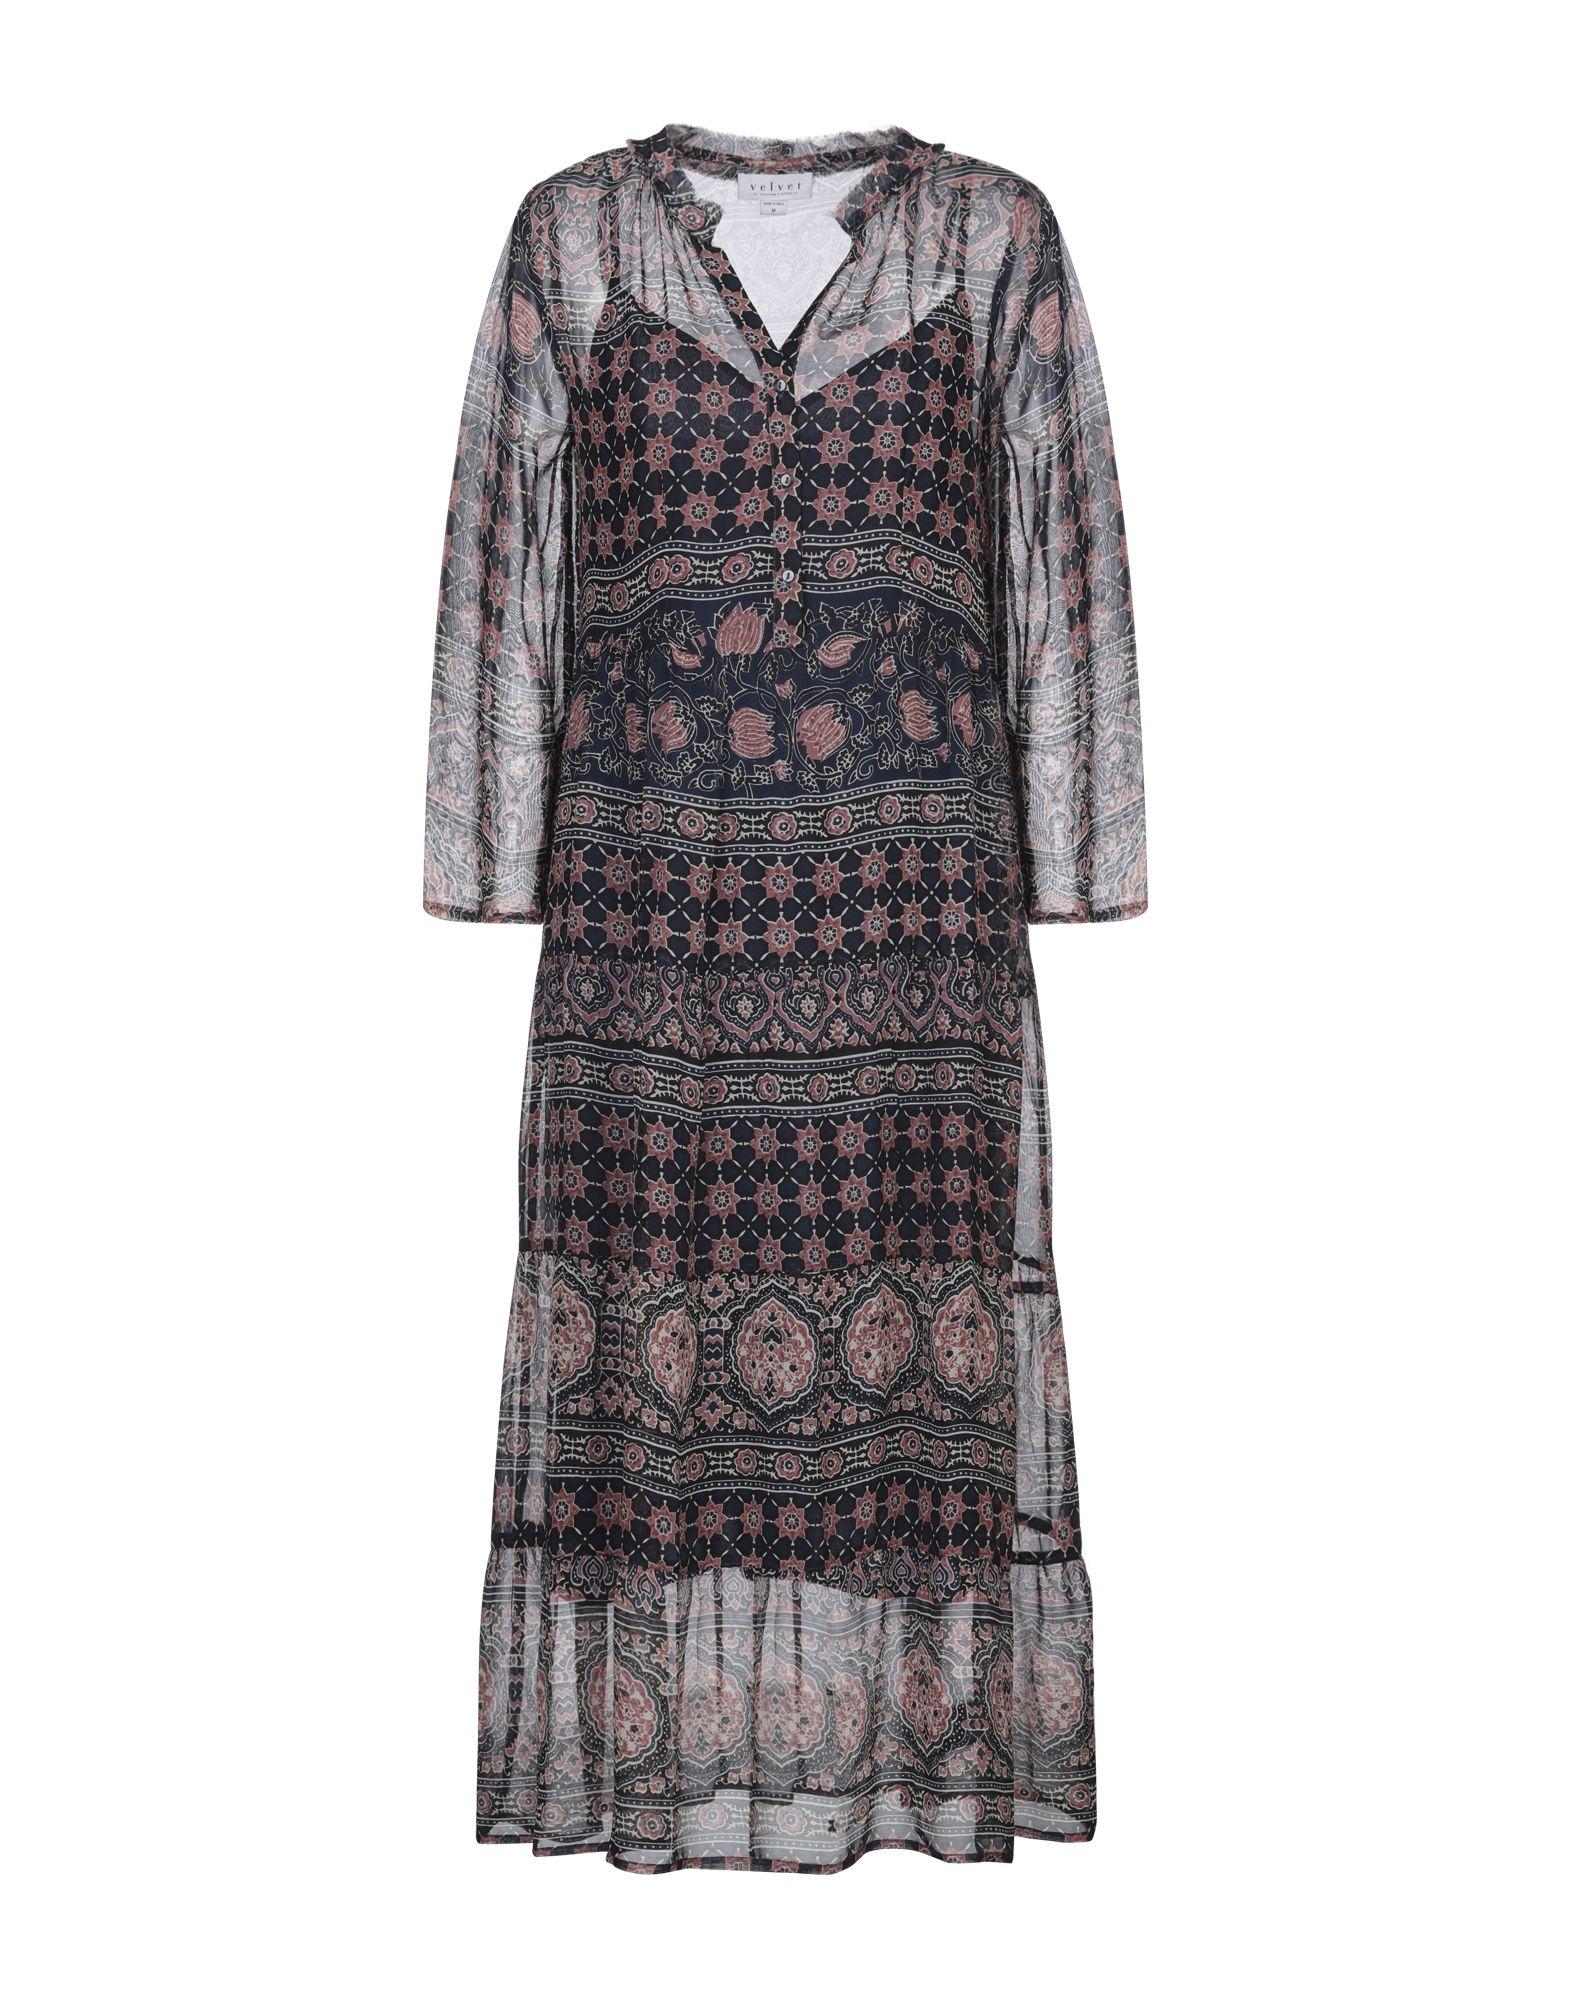 VELVET by GRAHAM & SPENCER Платье длиной 3/4